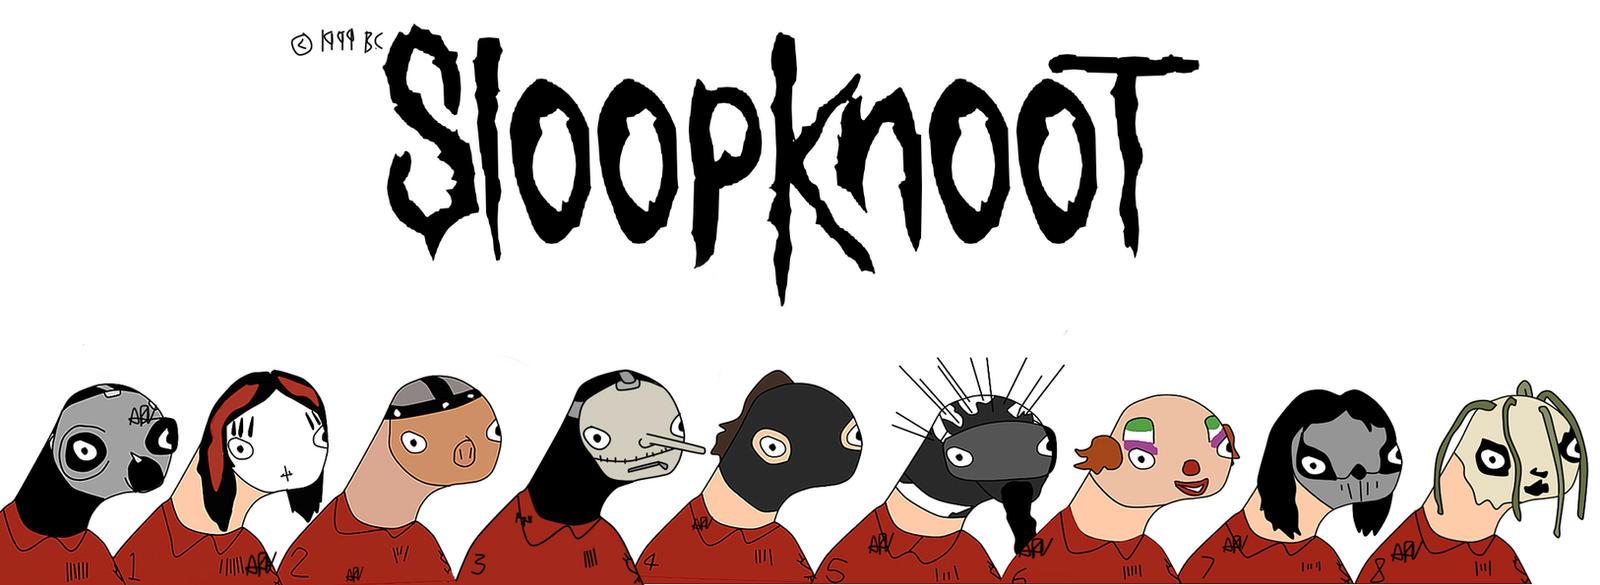 Sloopknoot (full) by ARandomUserl-l